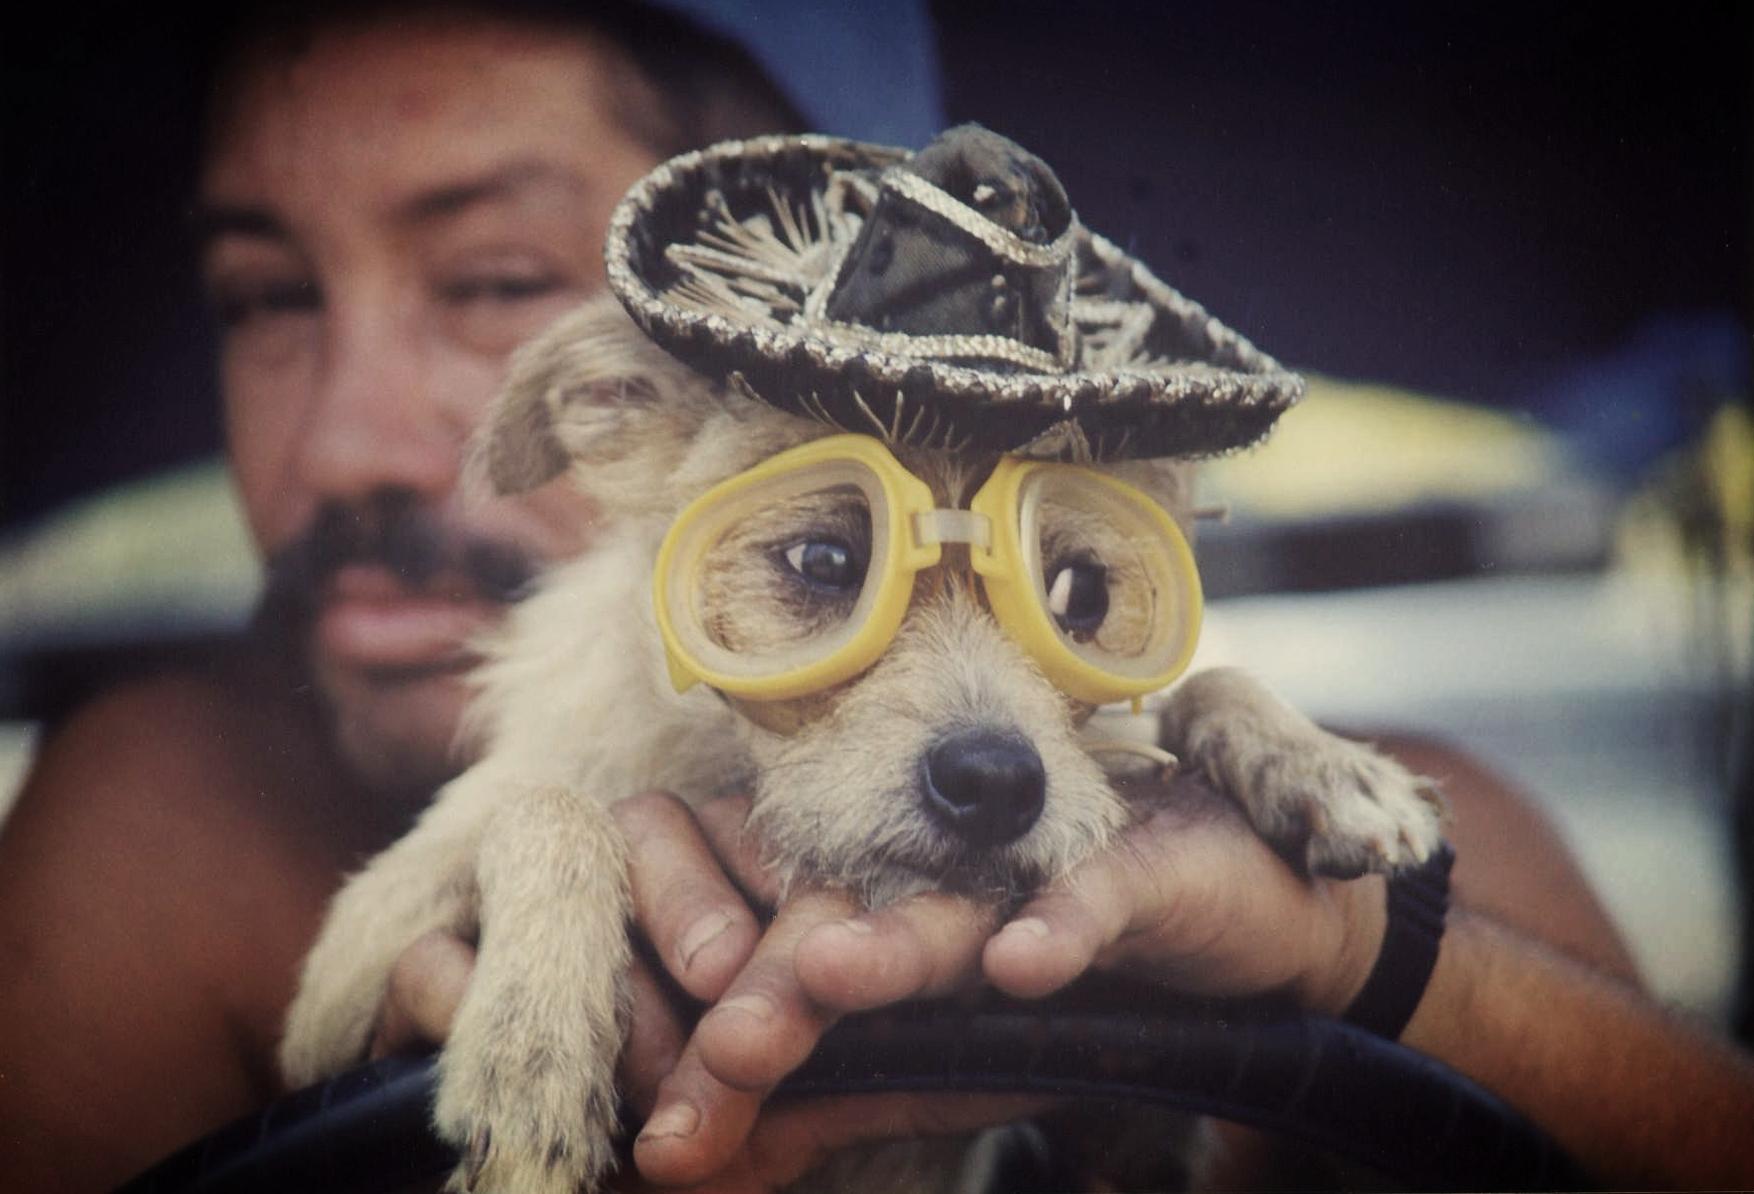 Cuba - Guy With Dog